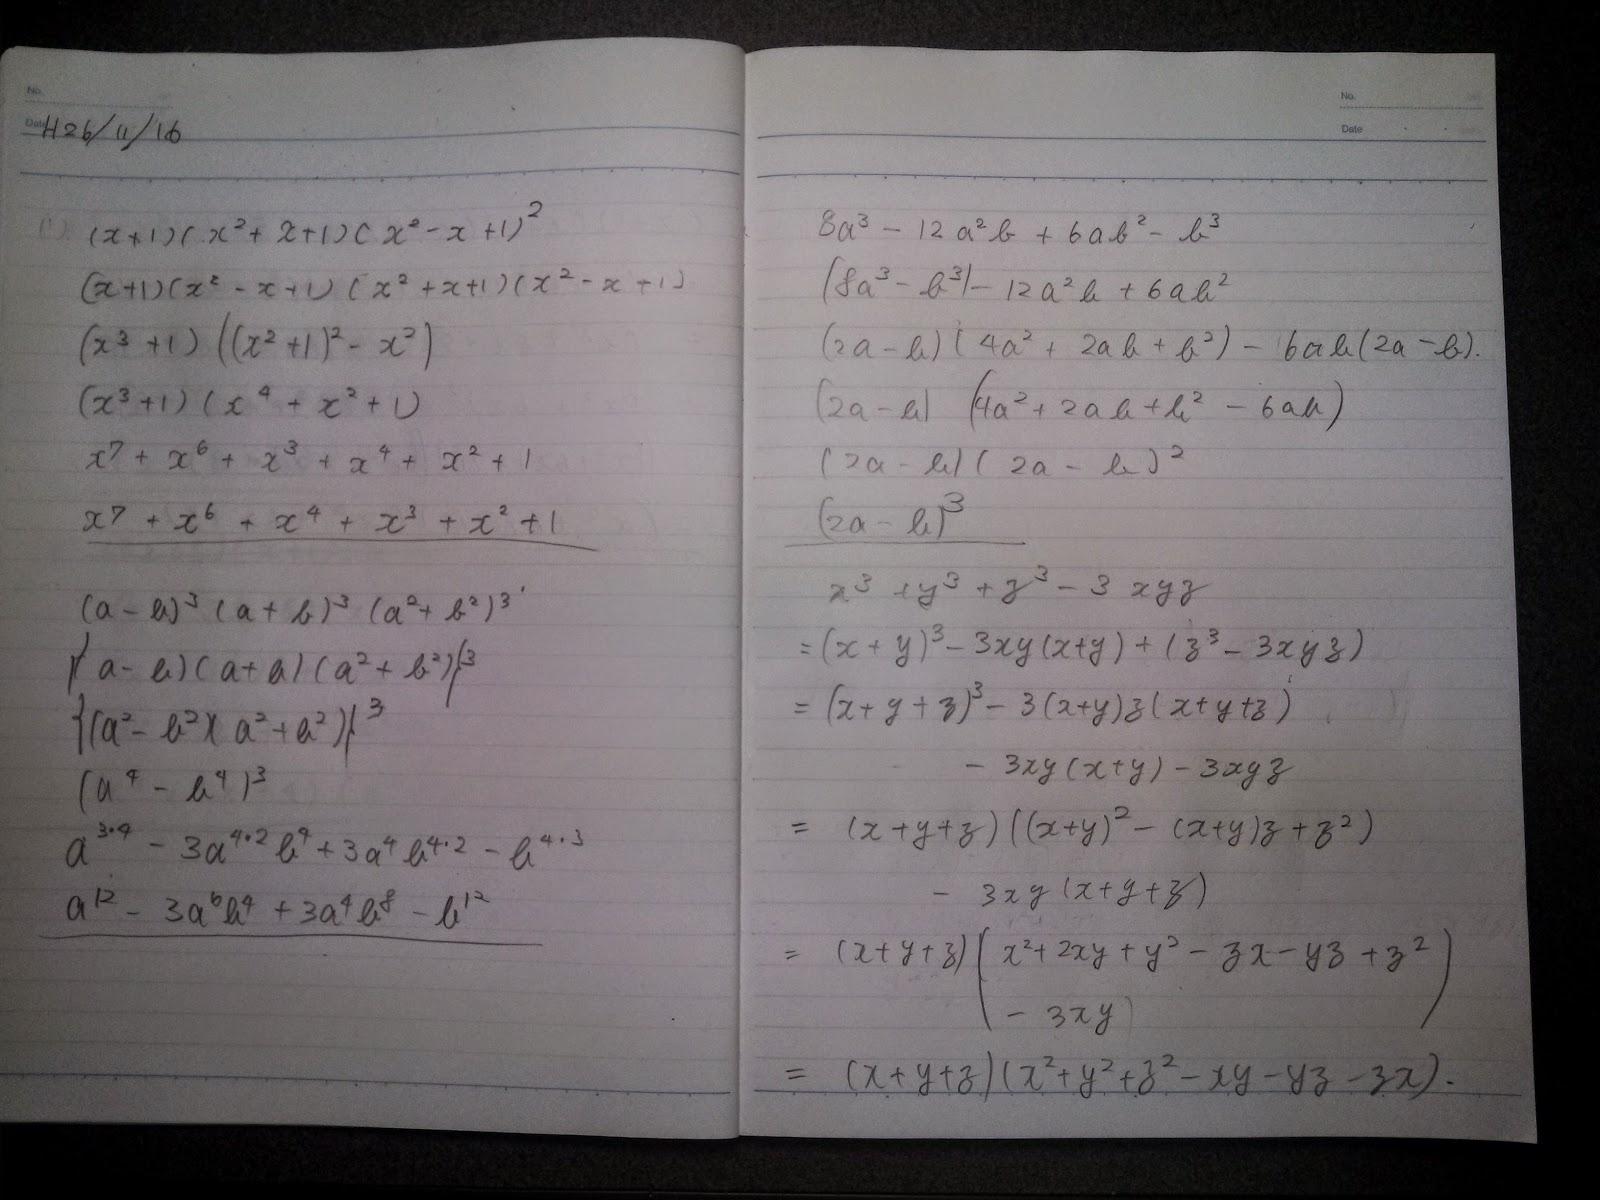 x^3~の式は公式として覚えても良さげだけど、覚わる気がしないw コツは如何に立方の和を用いた対称式に持ち込めるか、だな。まず立方の和を見つけ、対称式 へ変える。